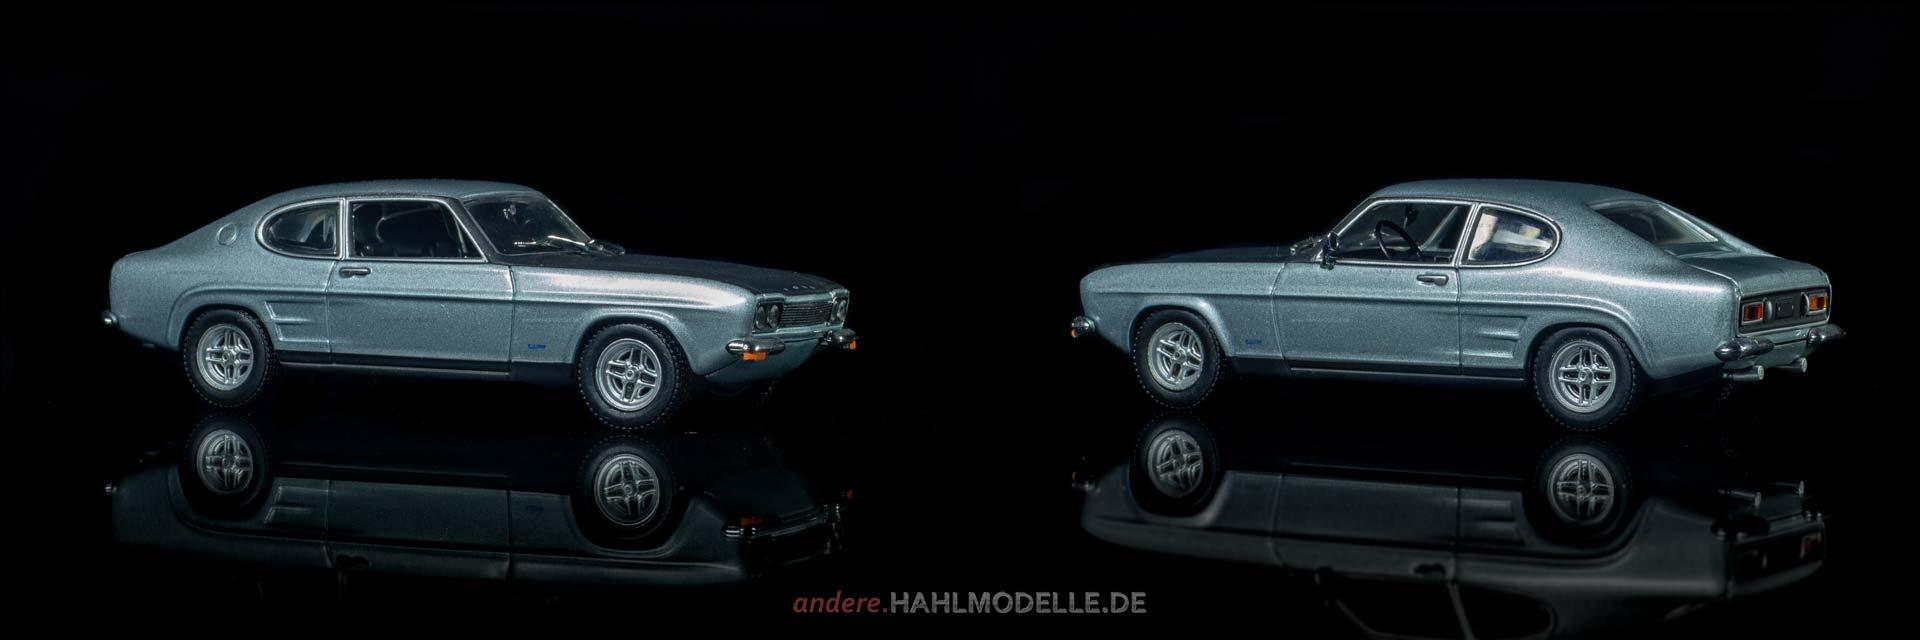 Ford Capri | Limousine | Minichamps | www.andere.hahlmodelle.de